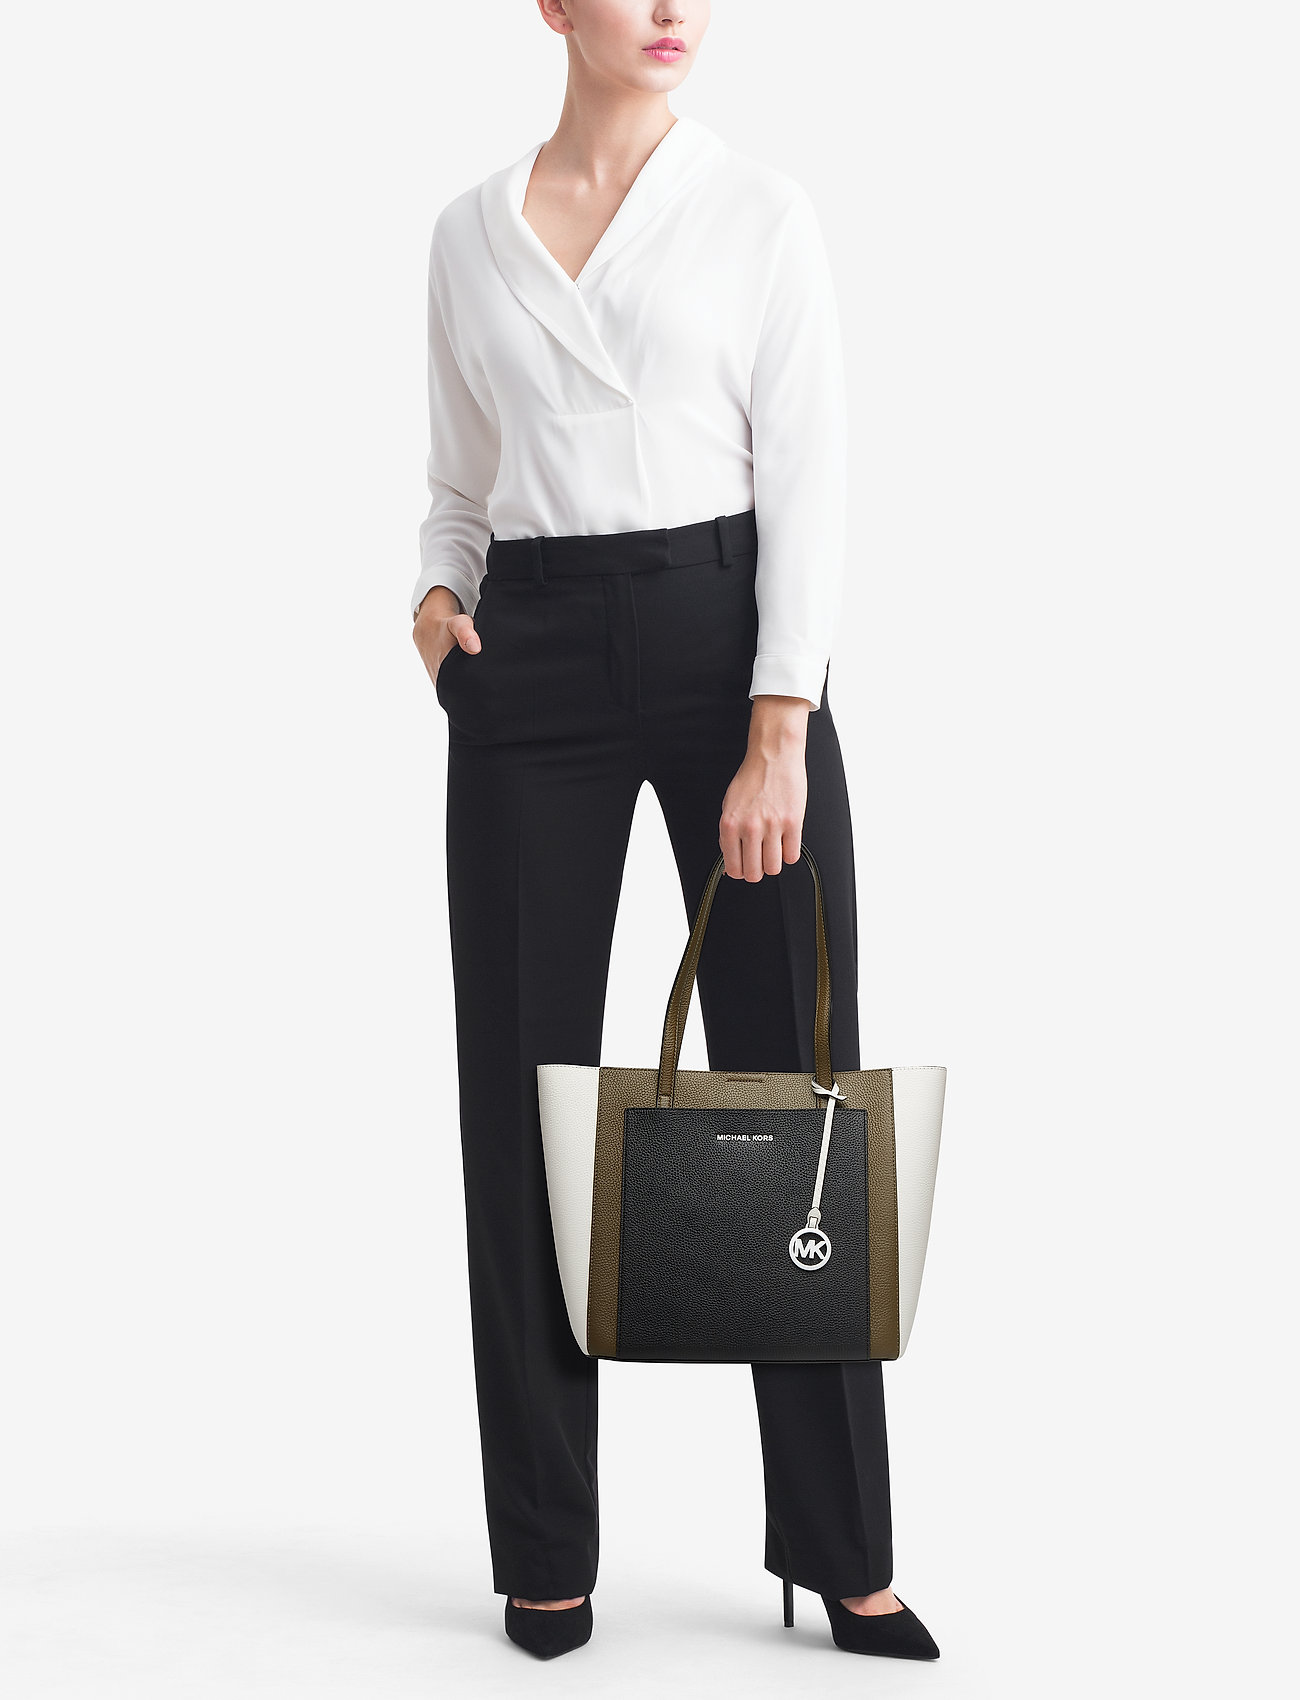 Michael Kors Bags GEMMA LG POCKET TOTE